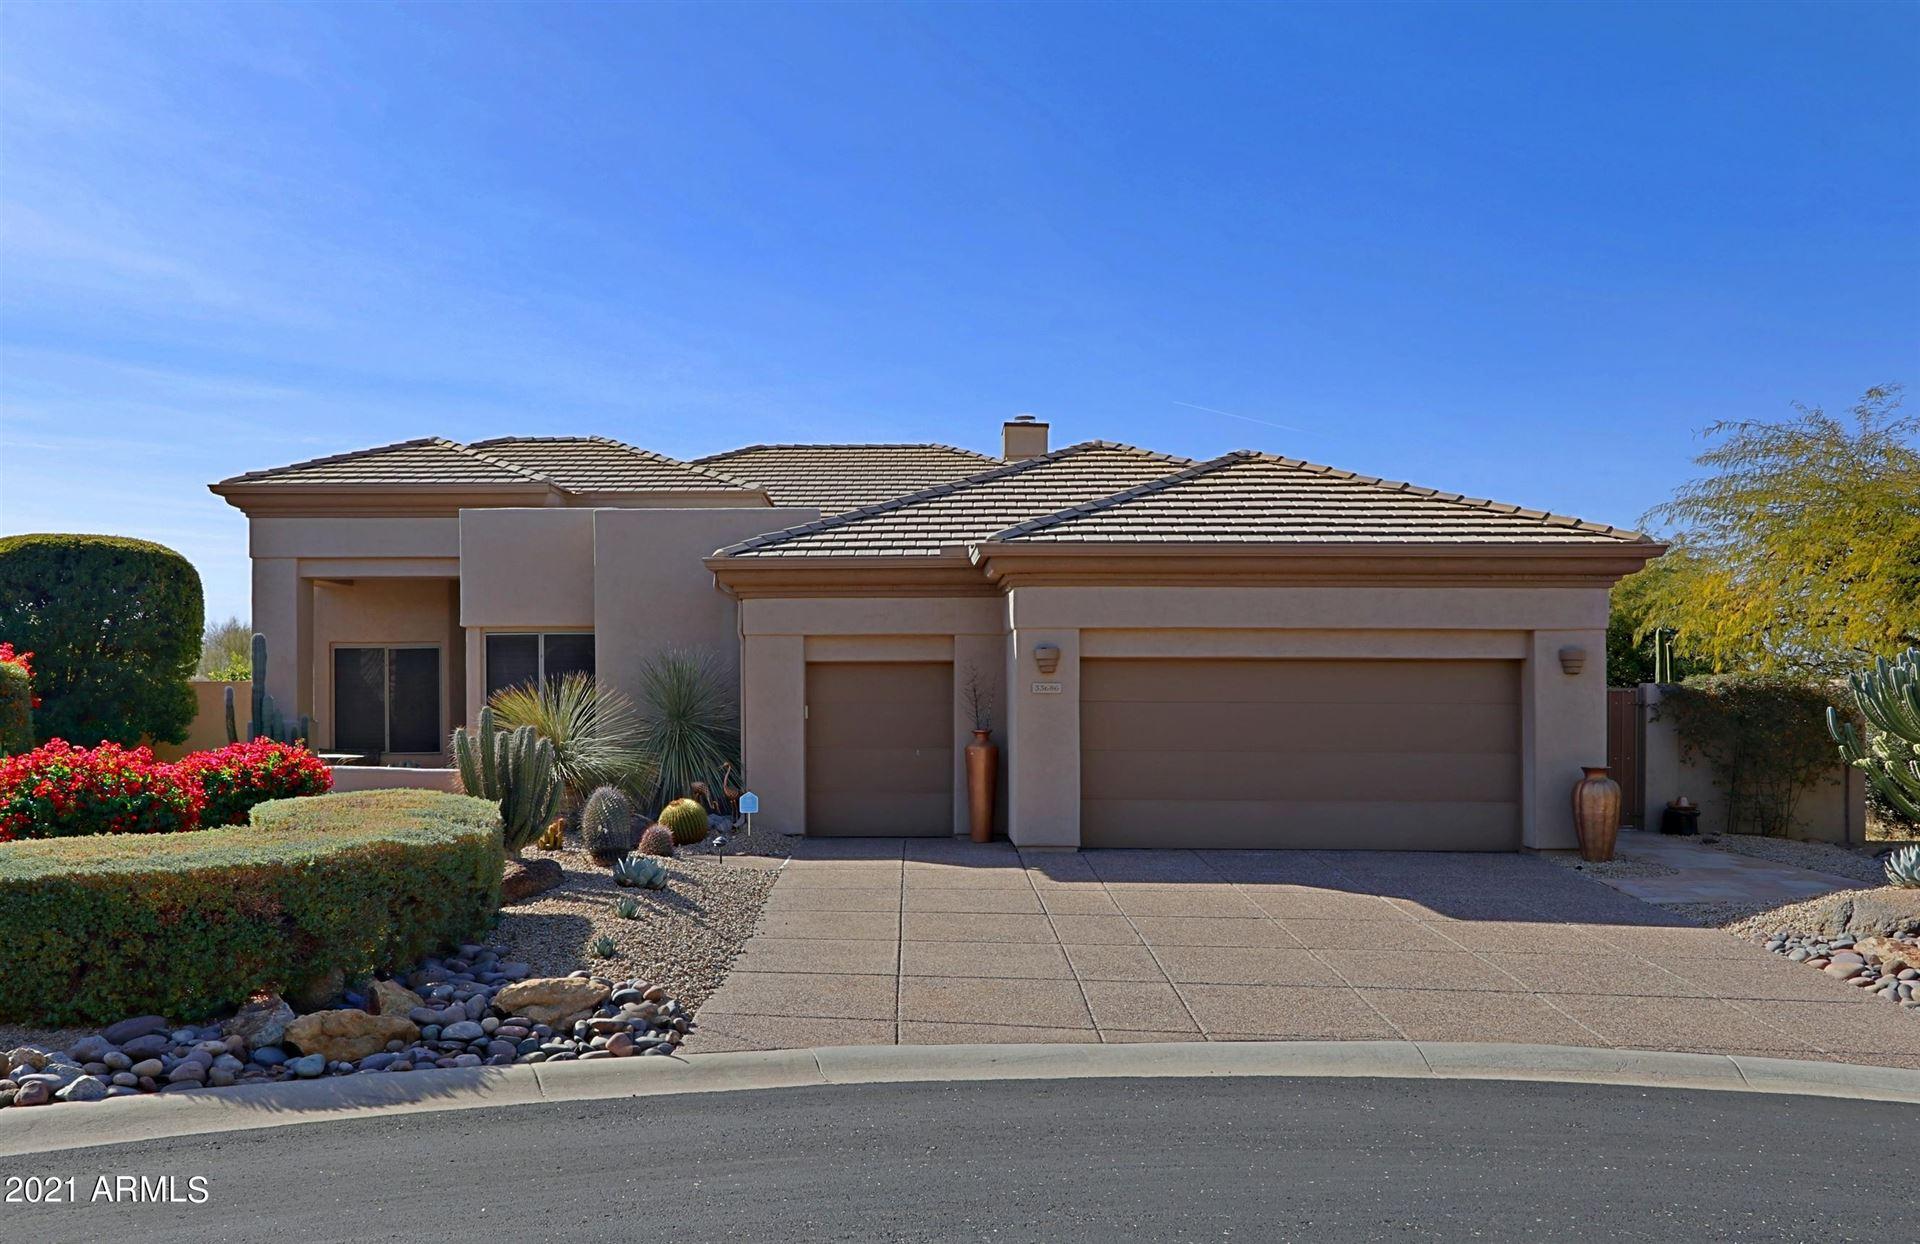 33686 N 71ST Street, Scottsdale, AZ 85266 - MLS#: 6184713